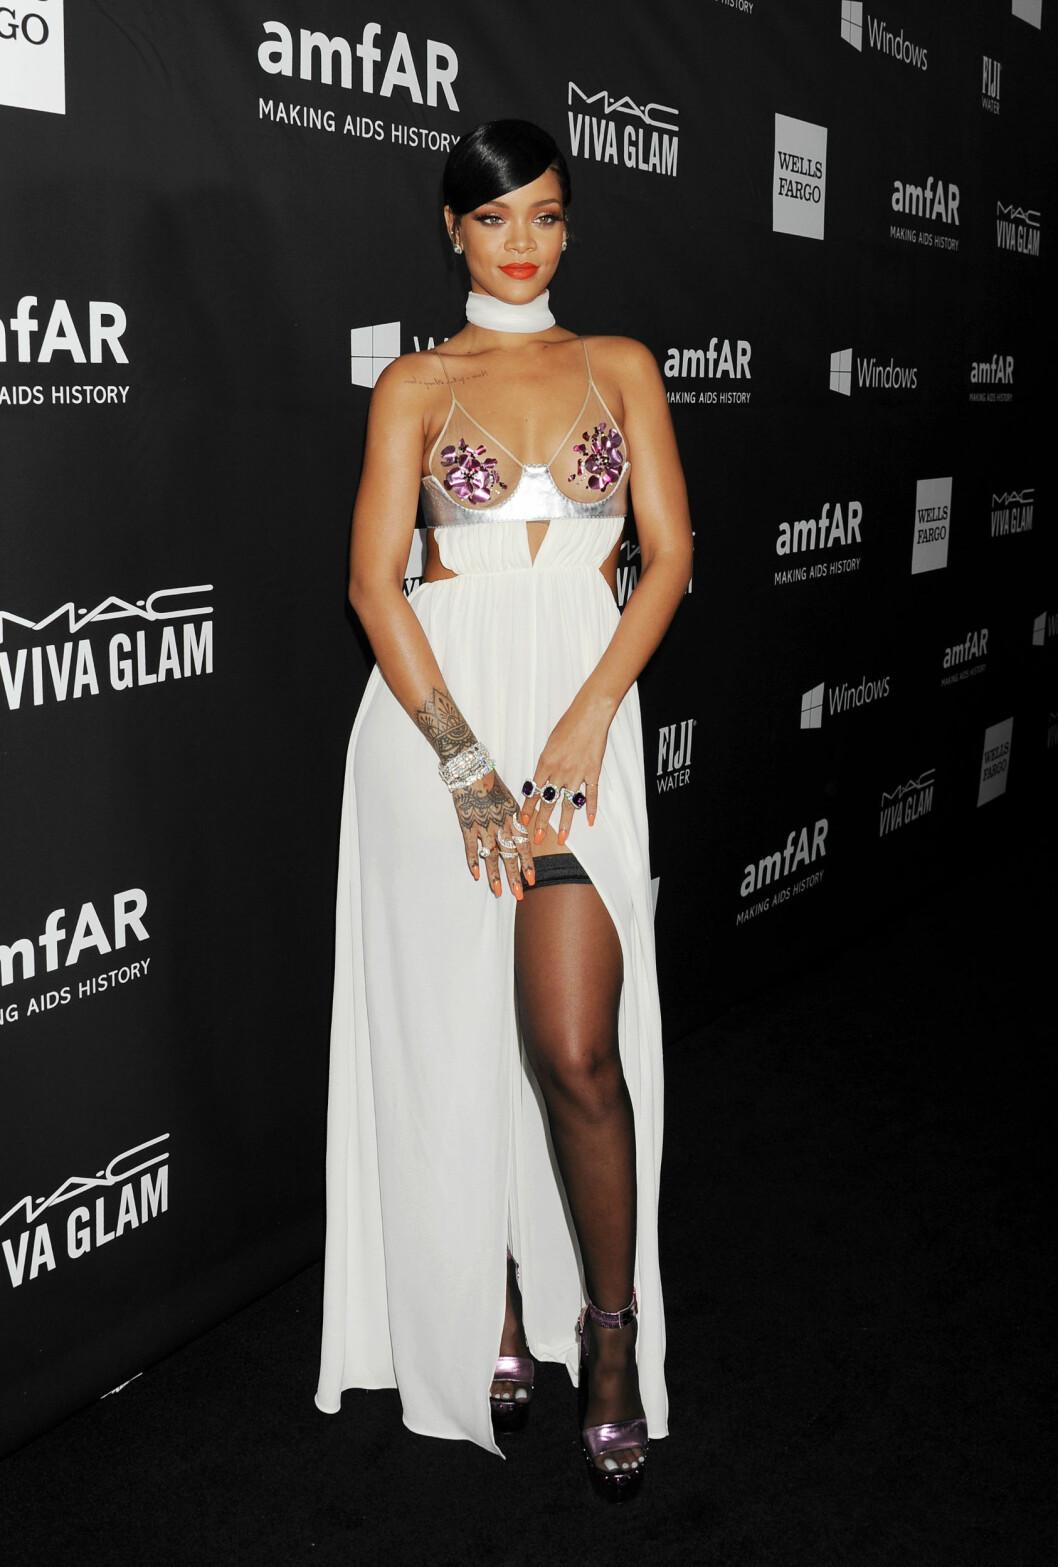 <strong>VÅGAL:</strong> Rihanna var også svært lettkledd på amfAR-gallaen. Hun viste både lår, midje og brystparti i denne Tom Ford-kreasjonen - som sikret henne terningkast to. Foto: Stella Pictures